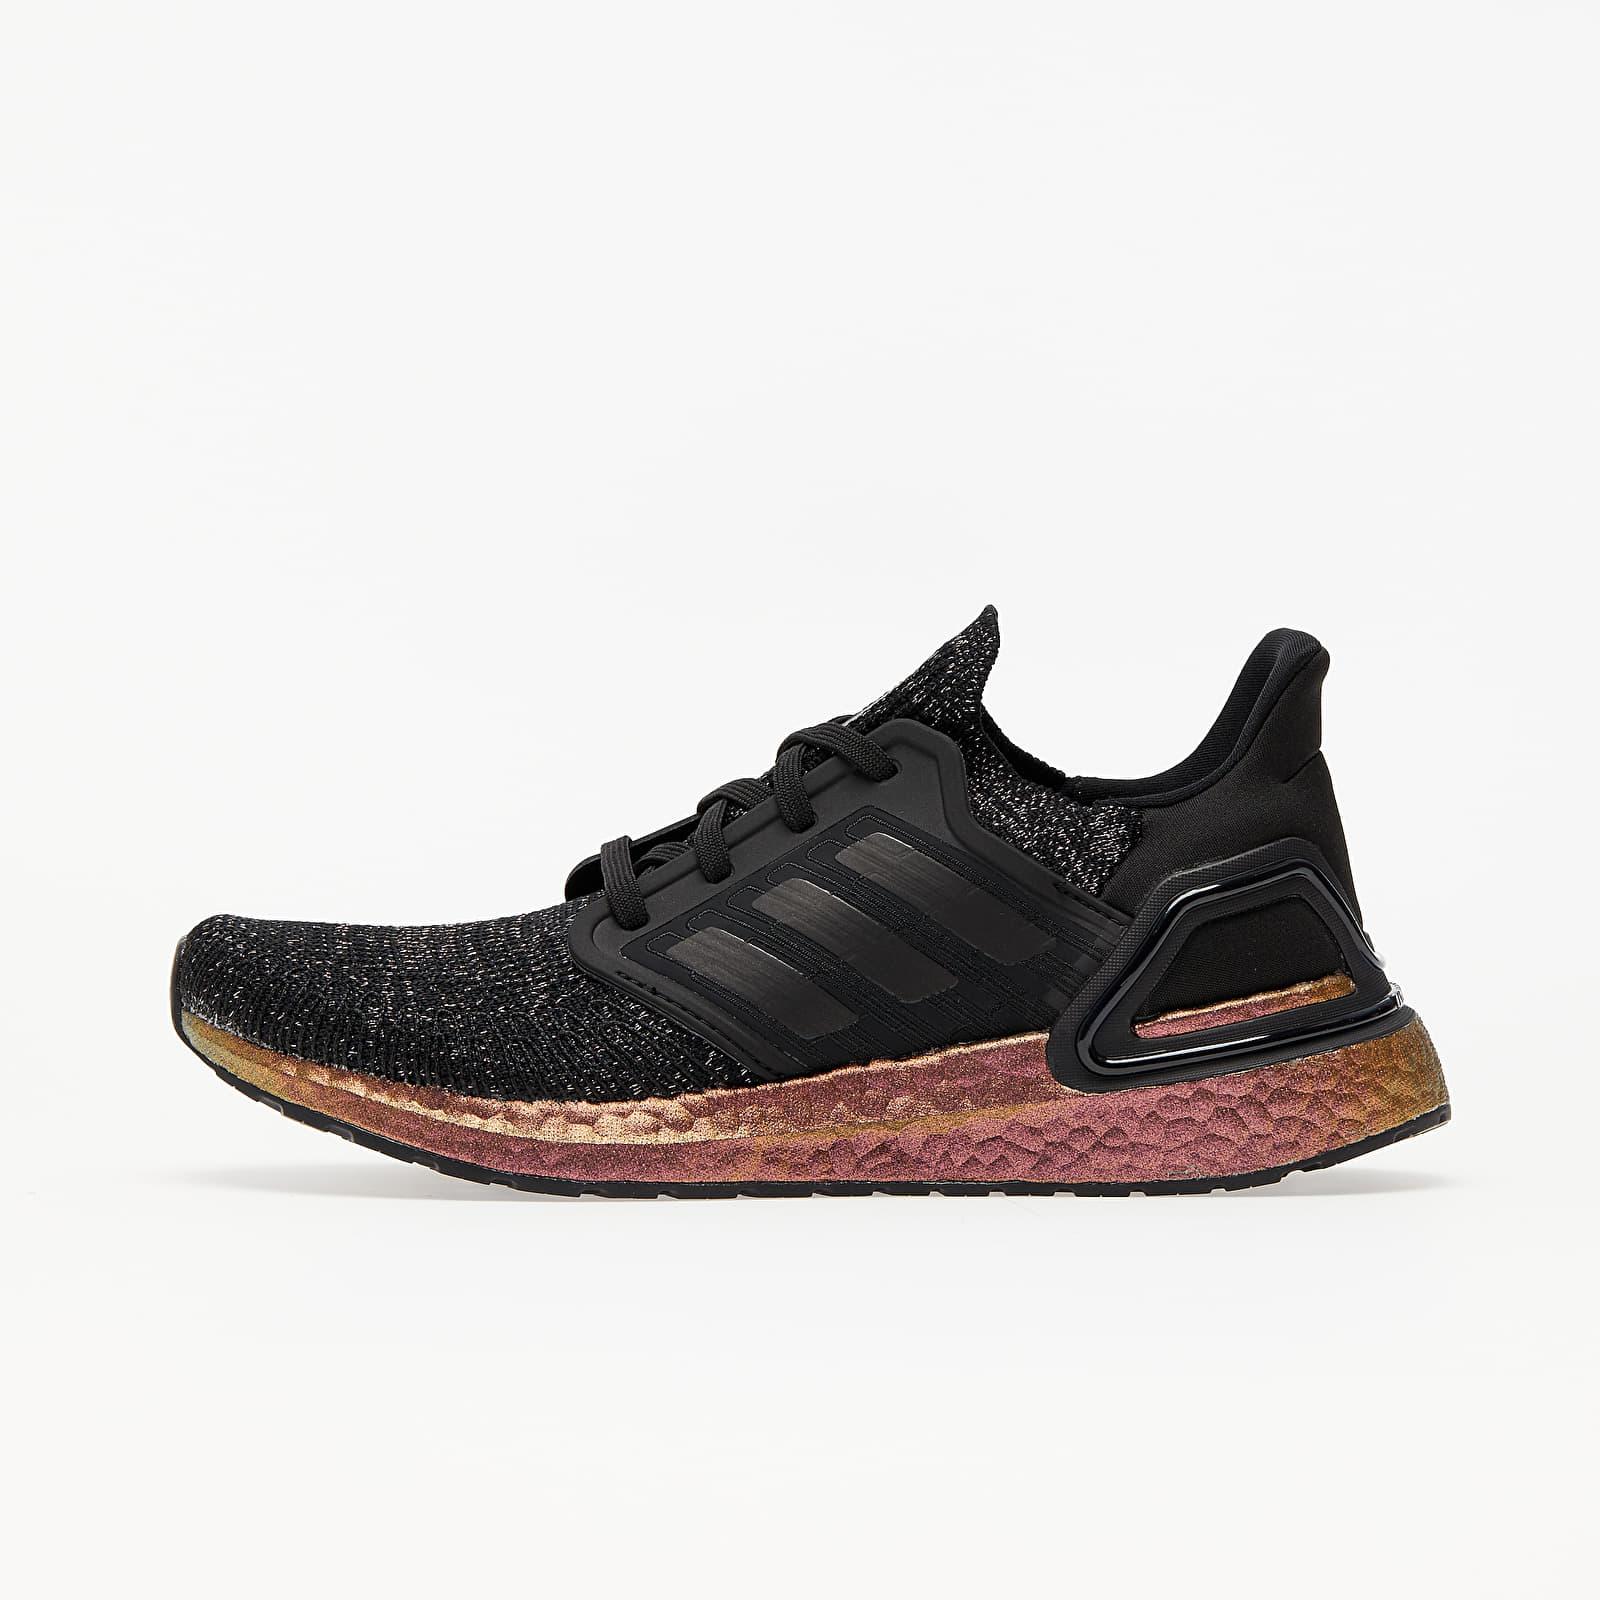 Women's shoes adidas UltraBOOST 20 W Core Black/ Core Black/ Signature Pink